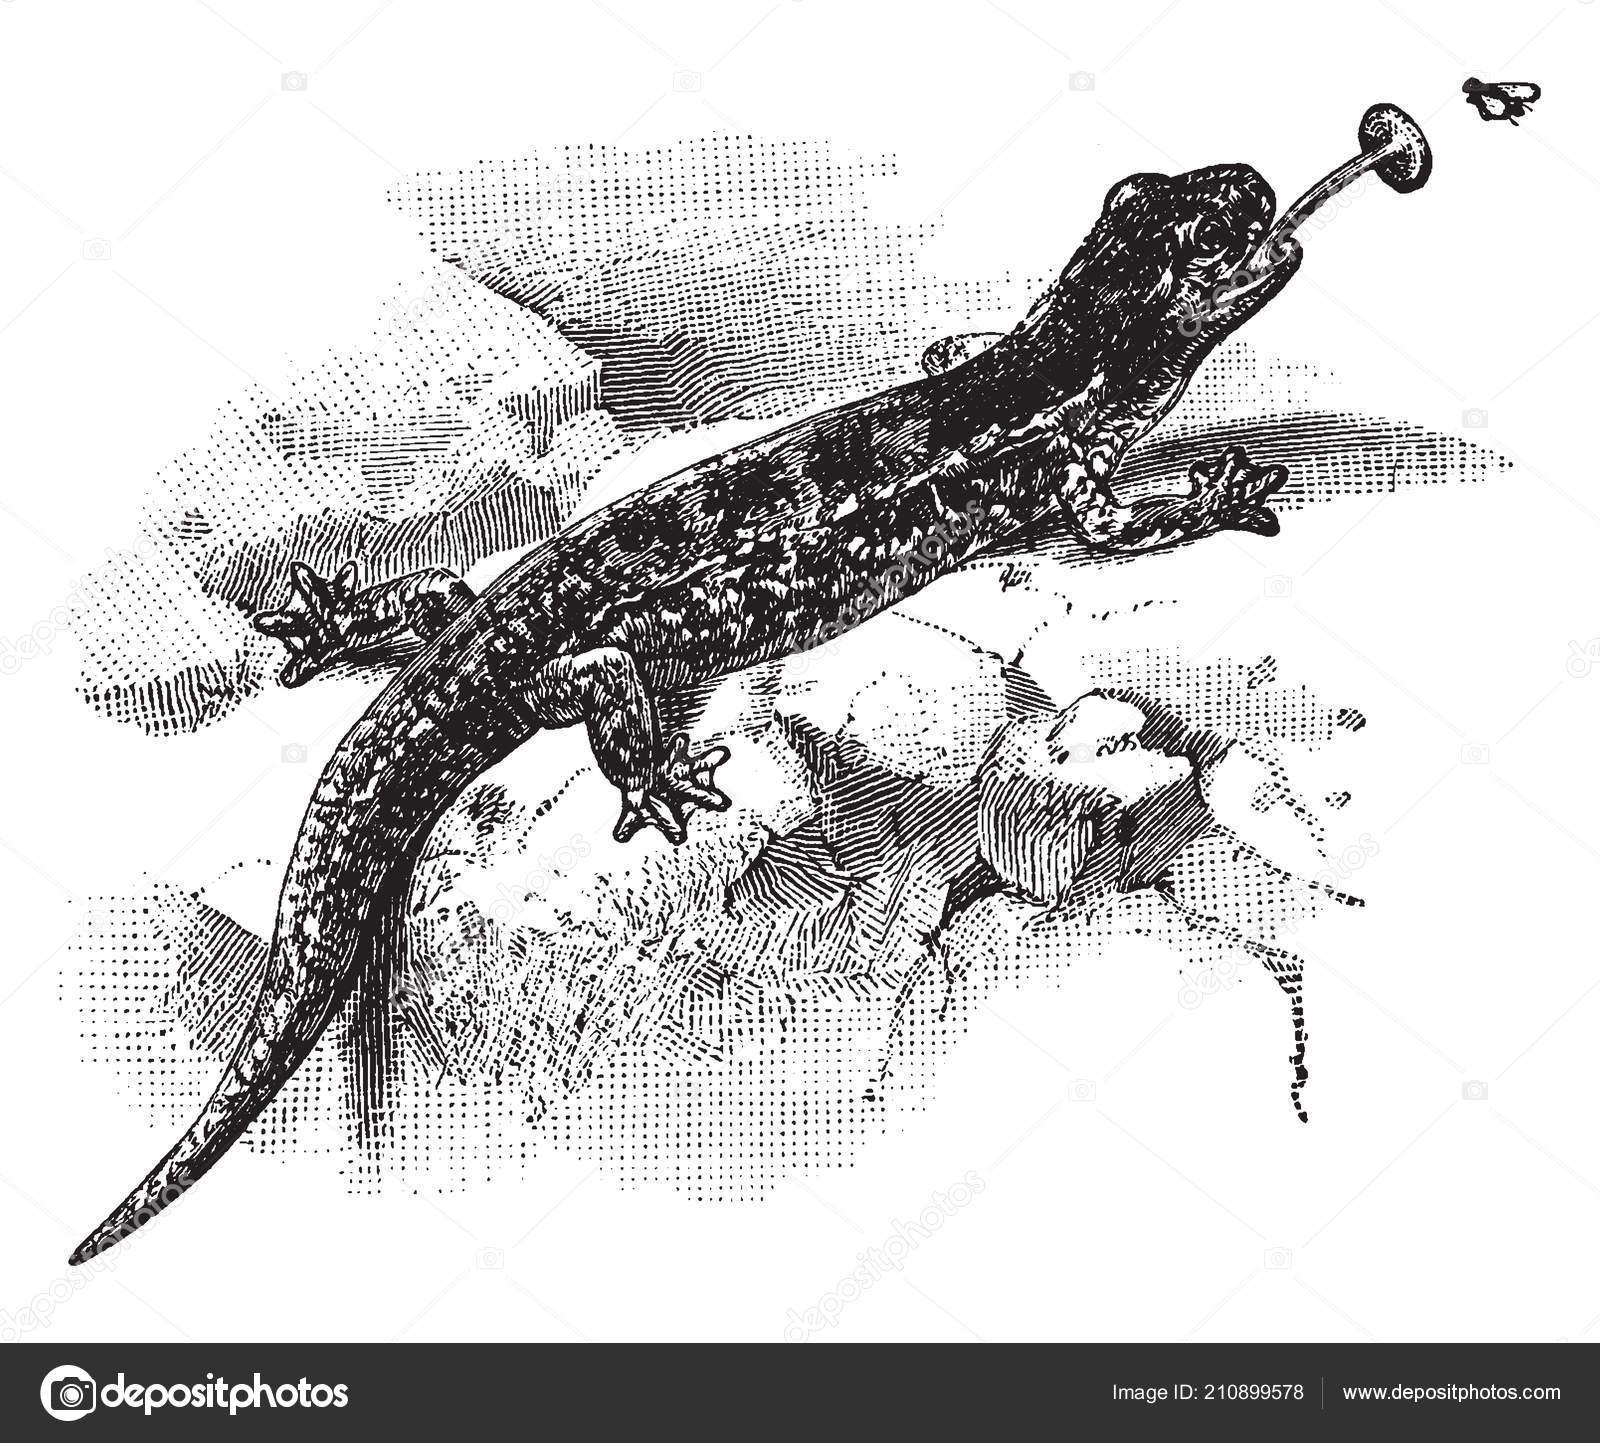 kitchen salamander professional knives 吃昆虫的红蝾螈复古线画或雕刻插图 图库矢量图像 c morphart 210899578 图库矢量图片